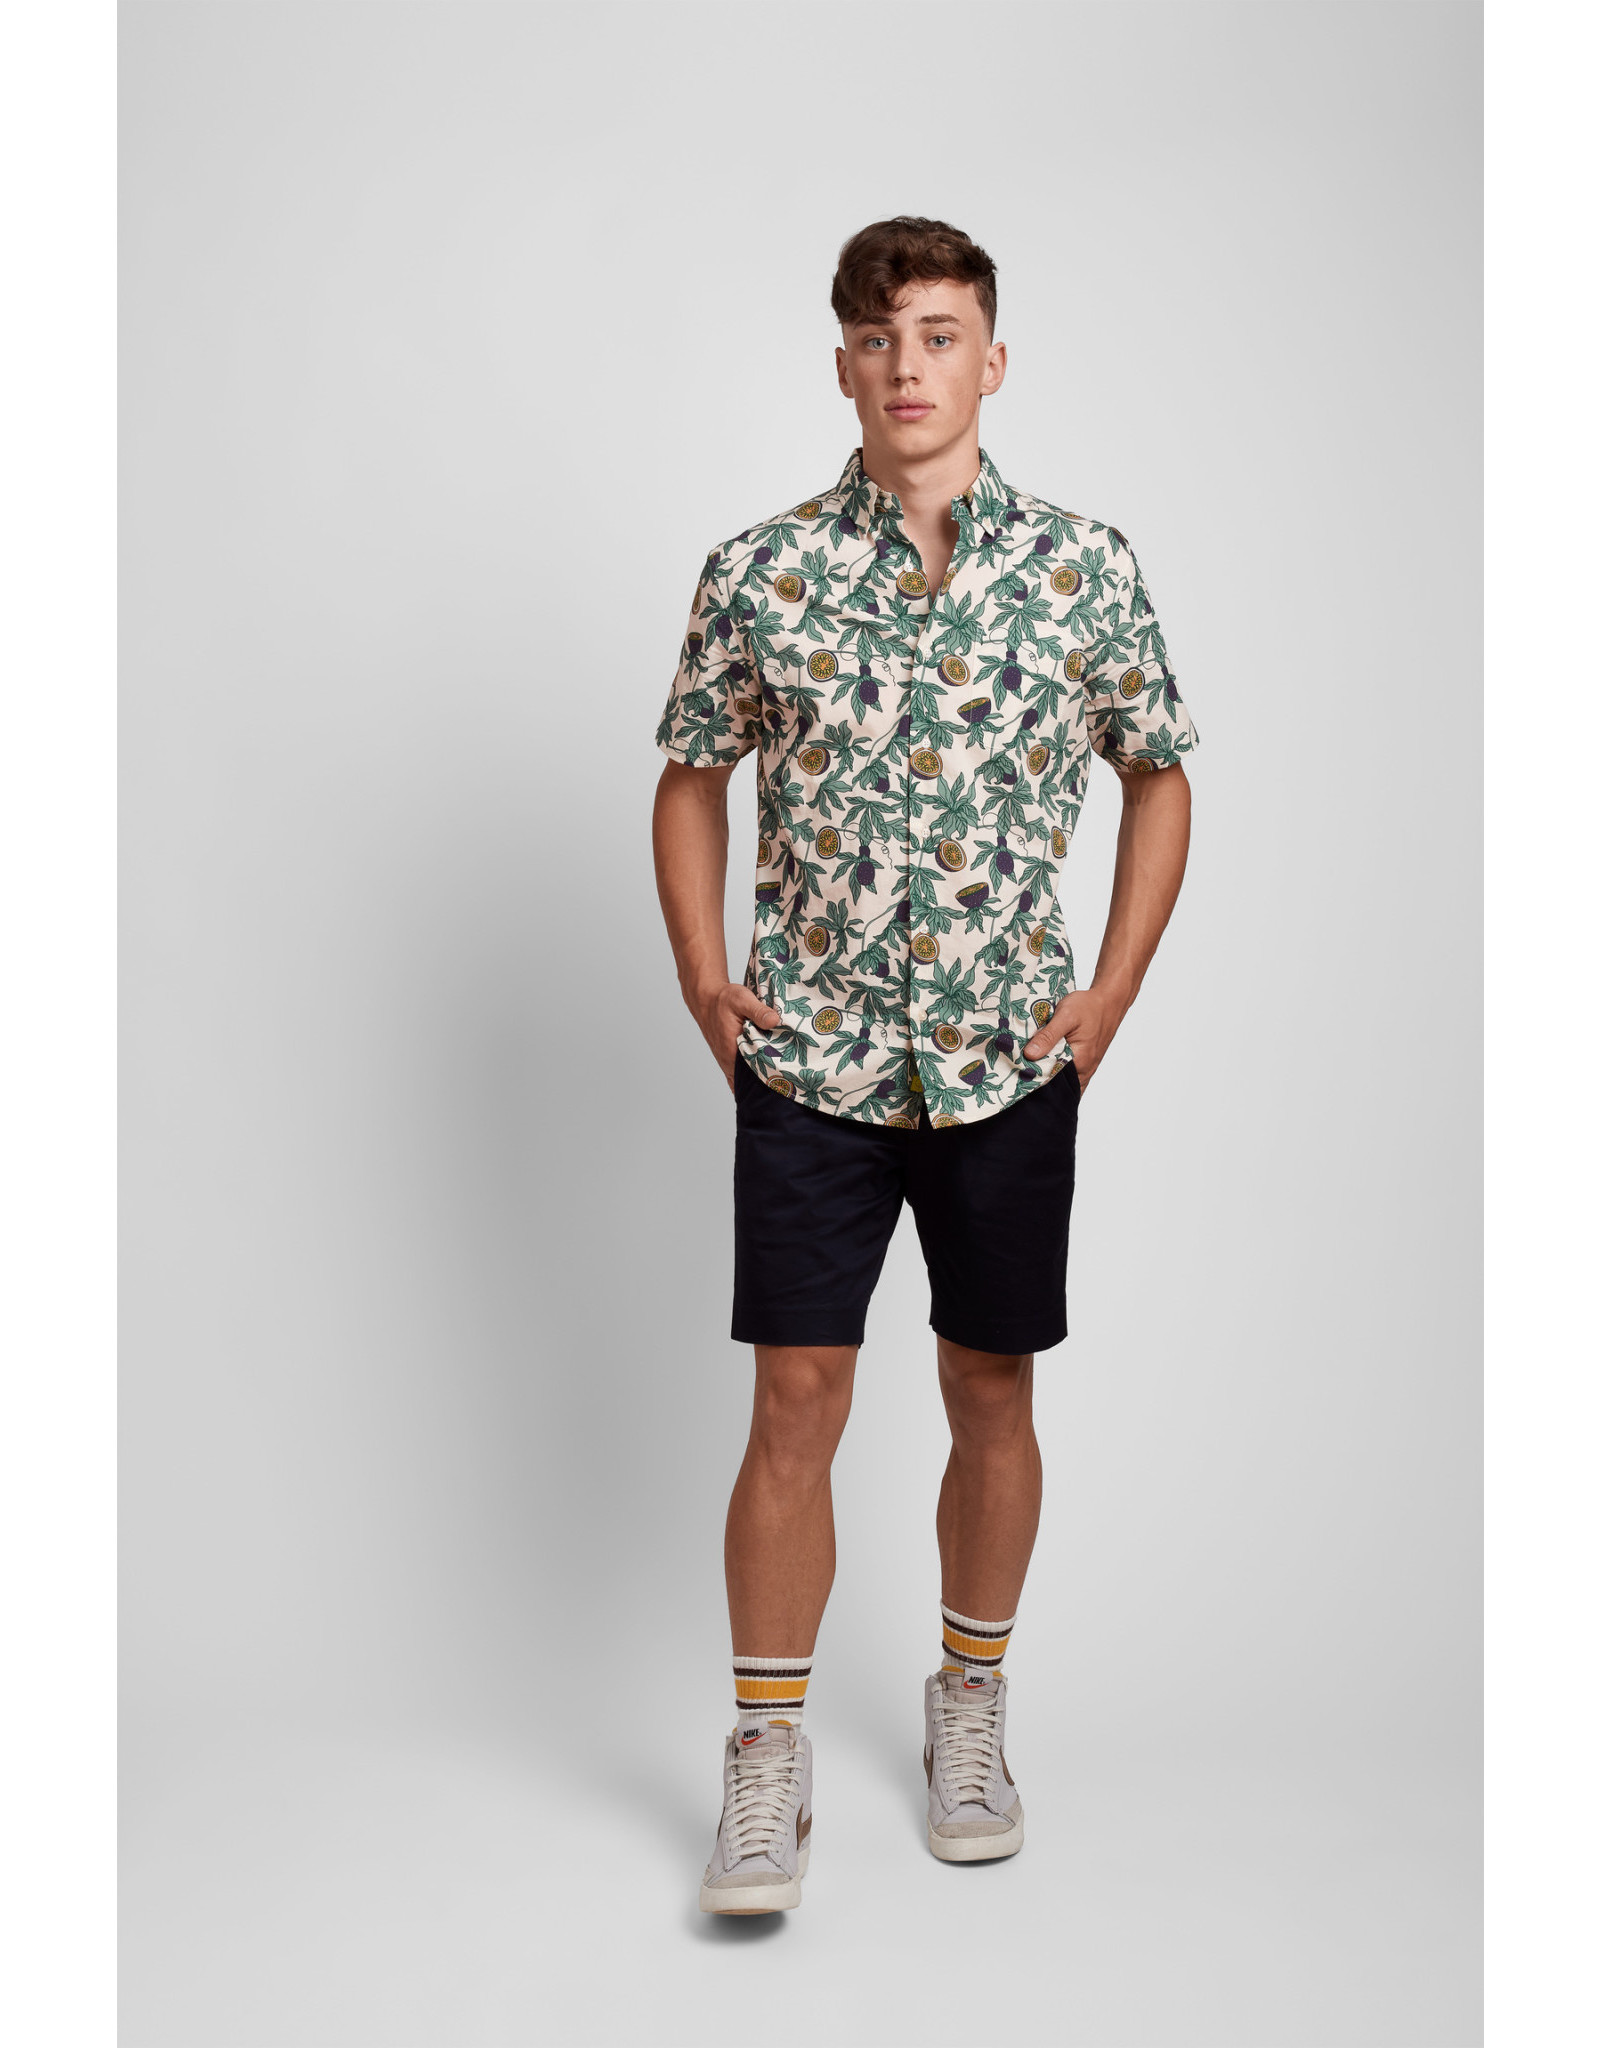 PCO - Passionfruit S/S Shirt